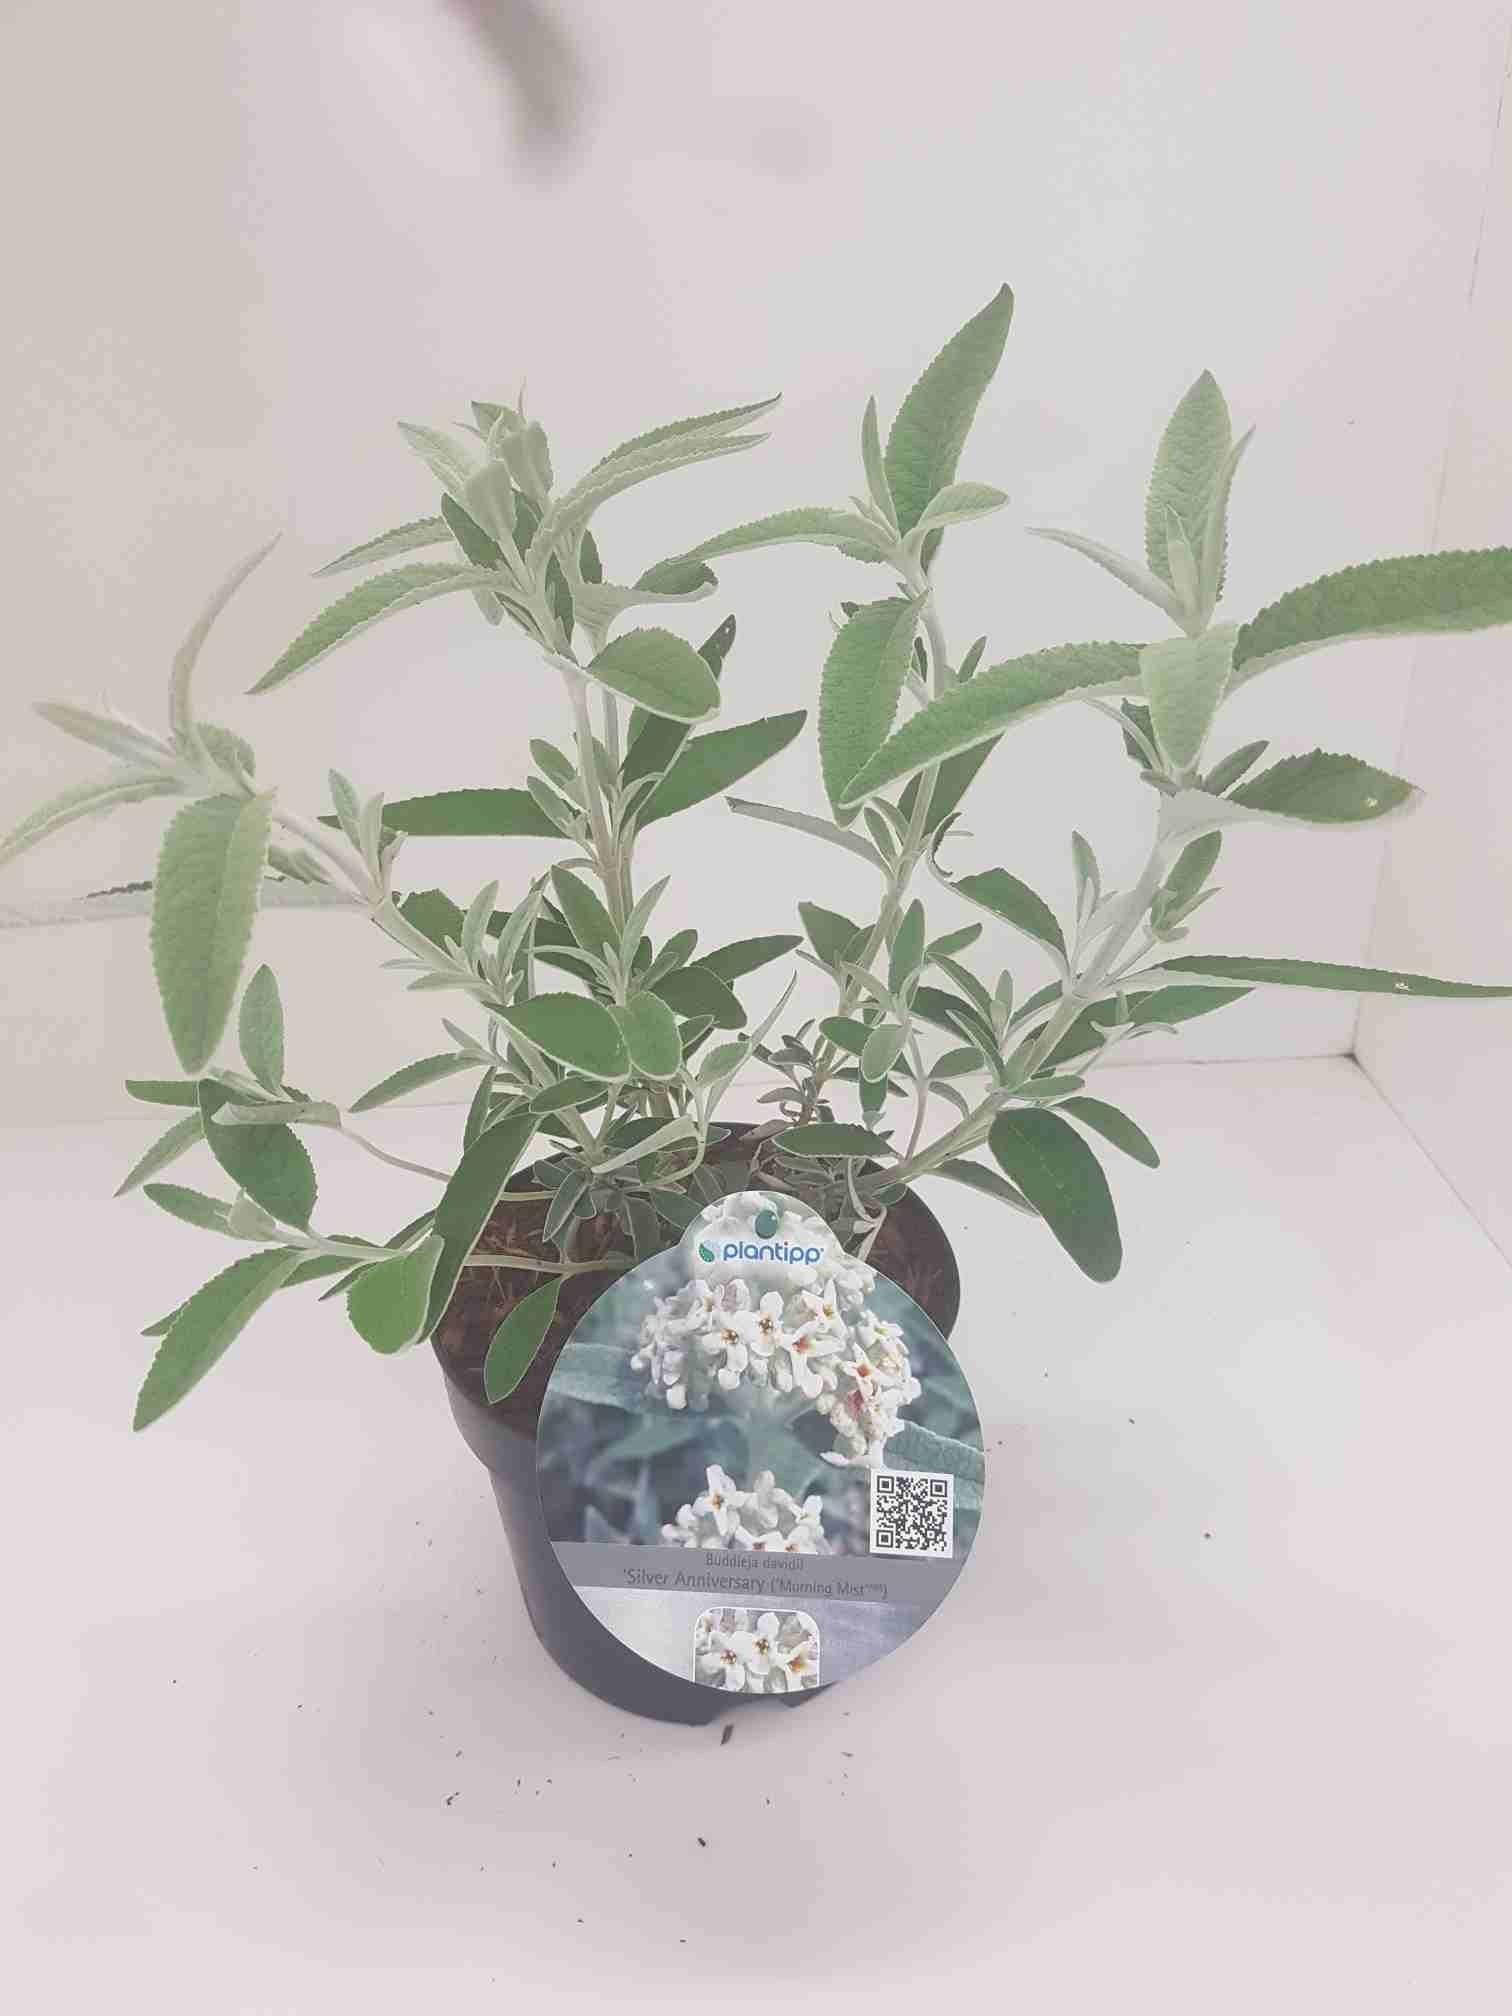 Vlinderstruik (Buddleja 'Silver Anniversary')-Plant in pot-40/60 cm. Kleur: wit